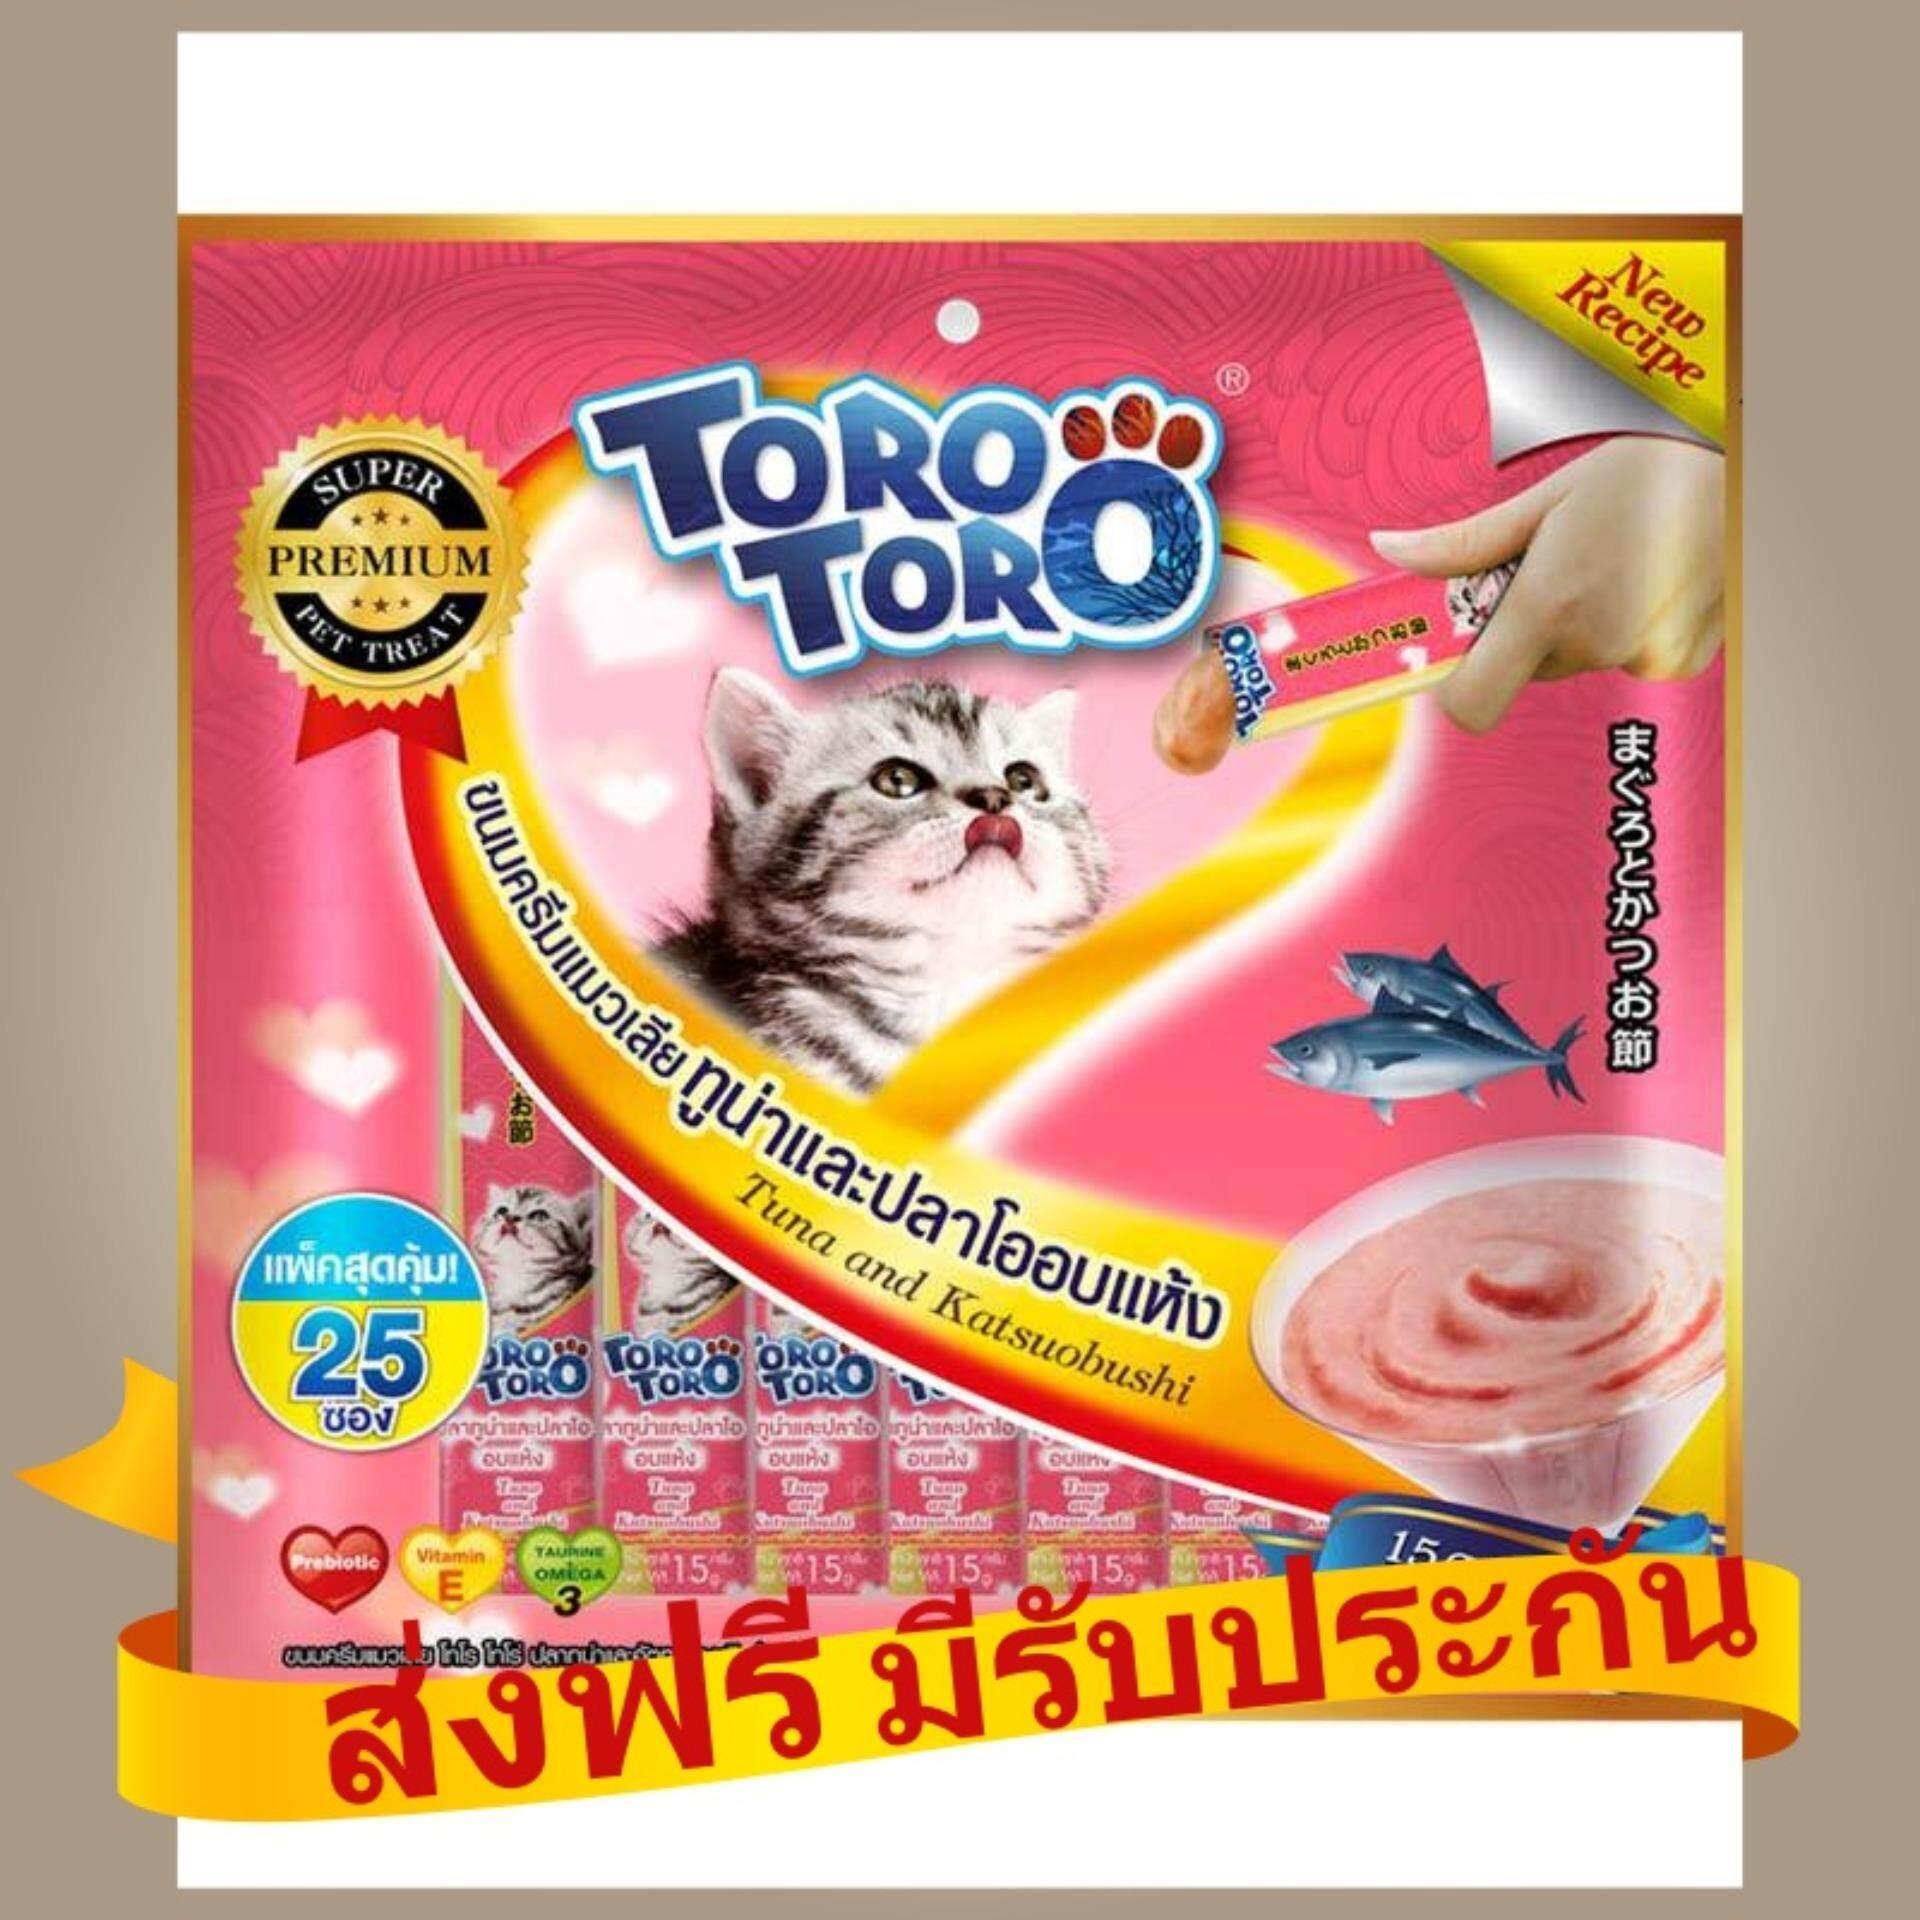 Torotoro โทโร โทโร่ ครีมแมวเลีย ทูน่าและปลาโออบแห้ง 15g.x25ซอง By Peeman.